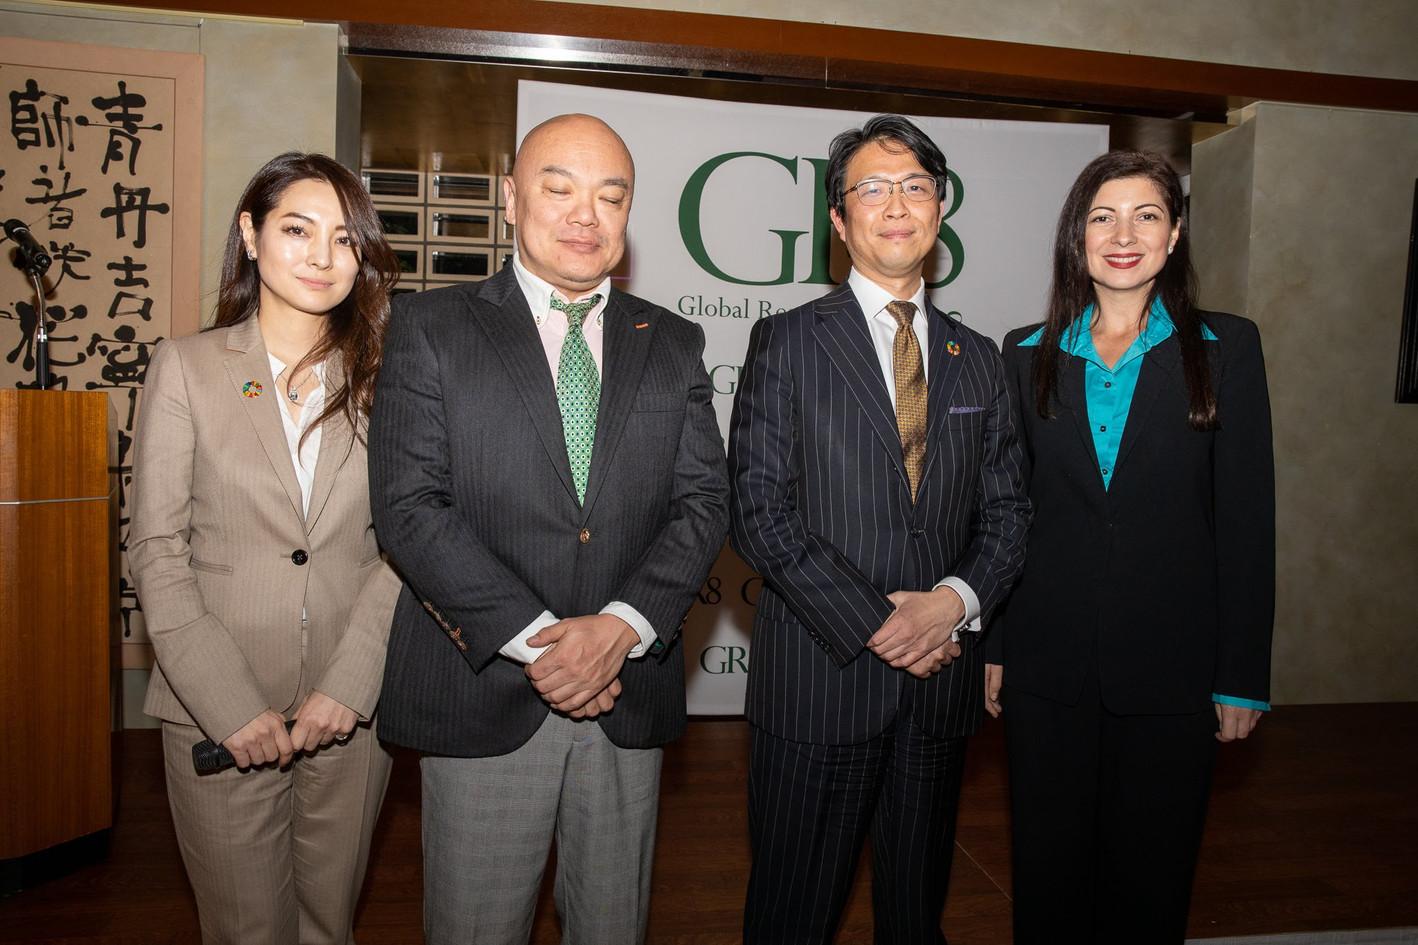 Ms. Sakiko Yamada, Dr. Shunji Mitsuyoshi, Mr. Hiro Mizuno & Ms. Narcisa Pheres.   Picture Credit: David Schneider